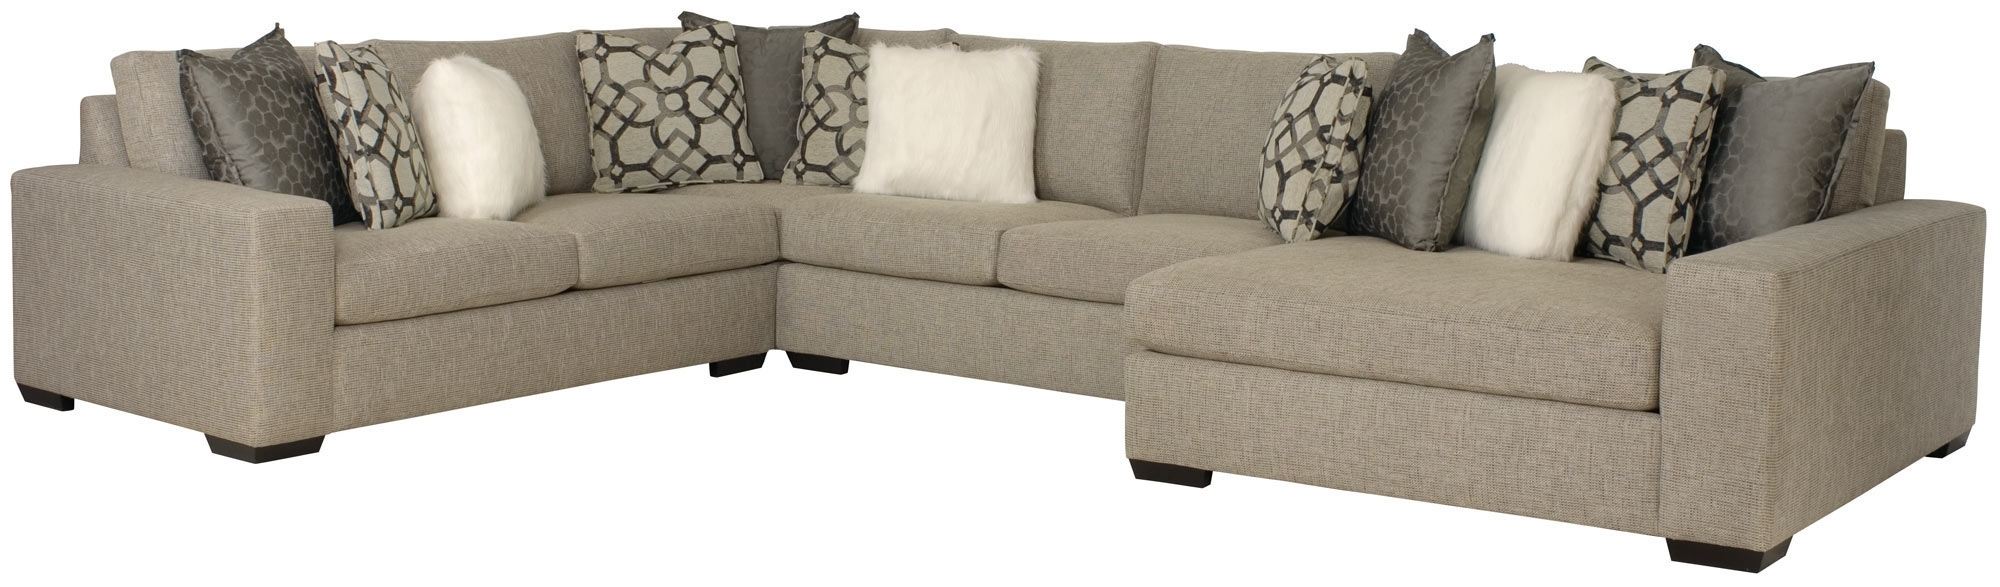 Bernhardt For Orlando Sectional Sofas (View 10 of 20)